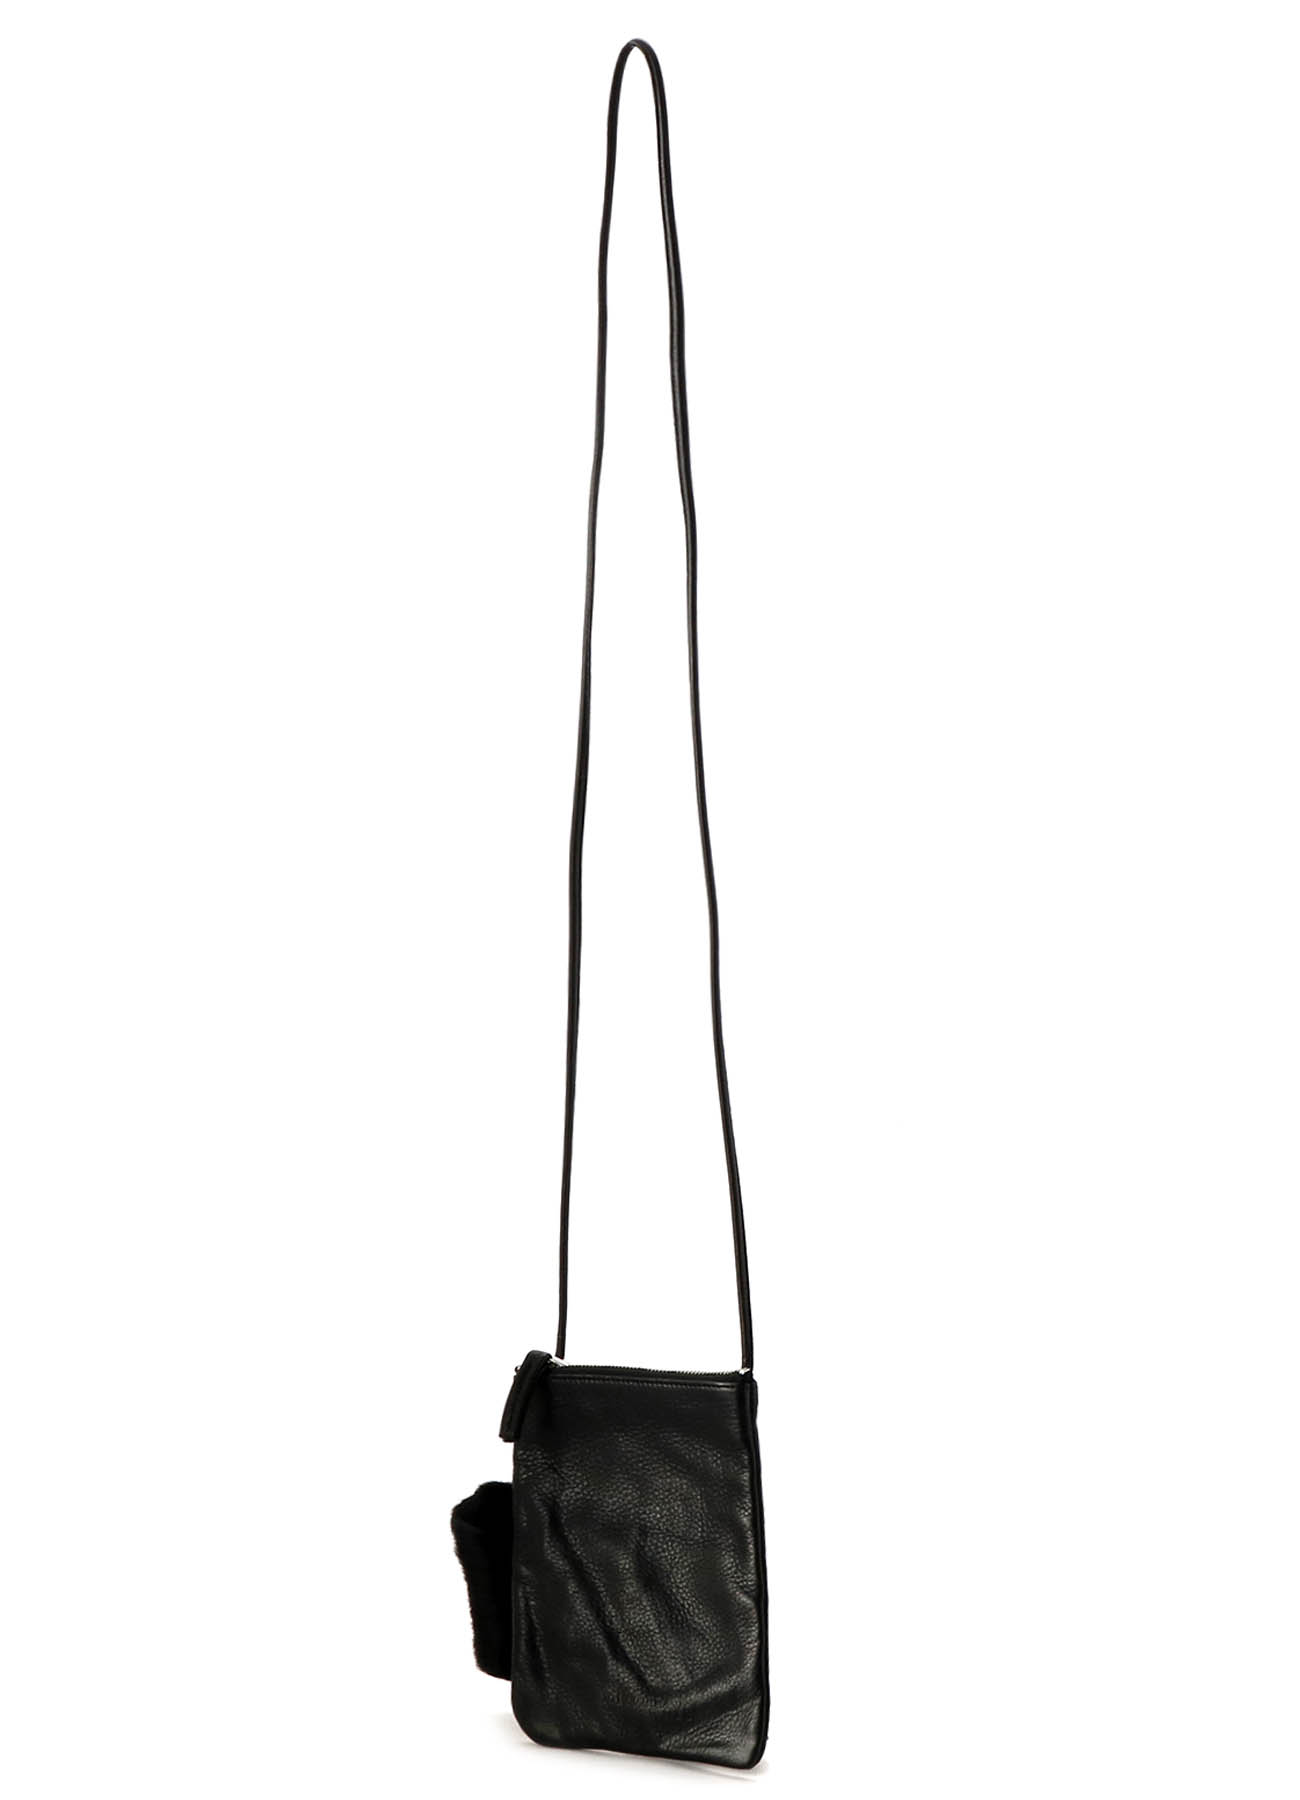 KAYONAKAMURAbyY's COMBI LEATHER RING POCHETTE